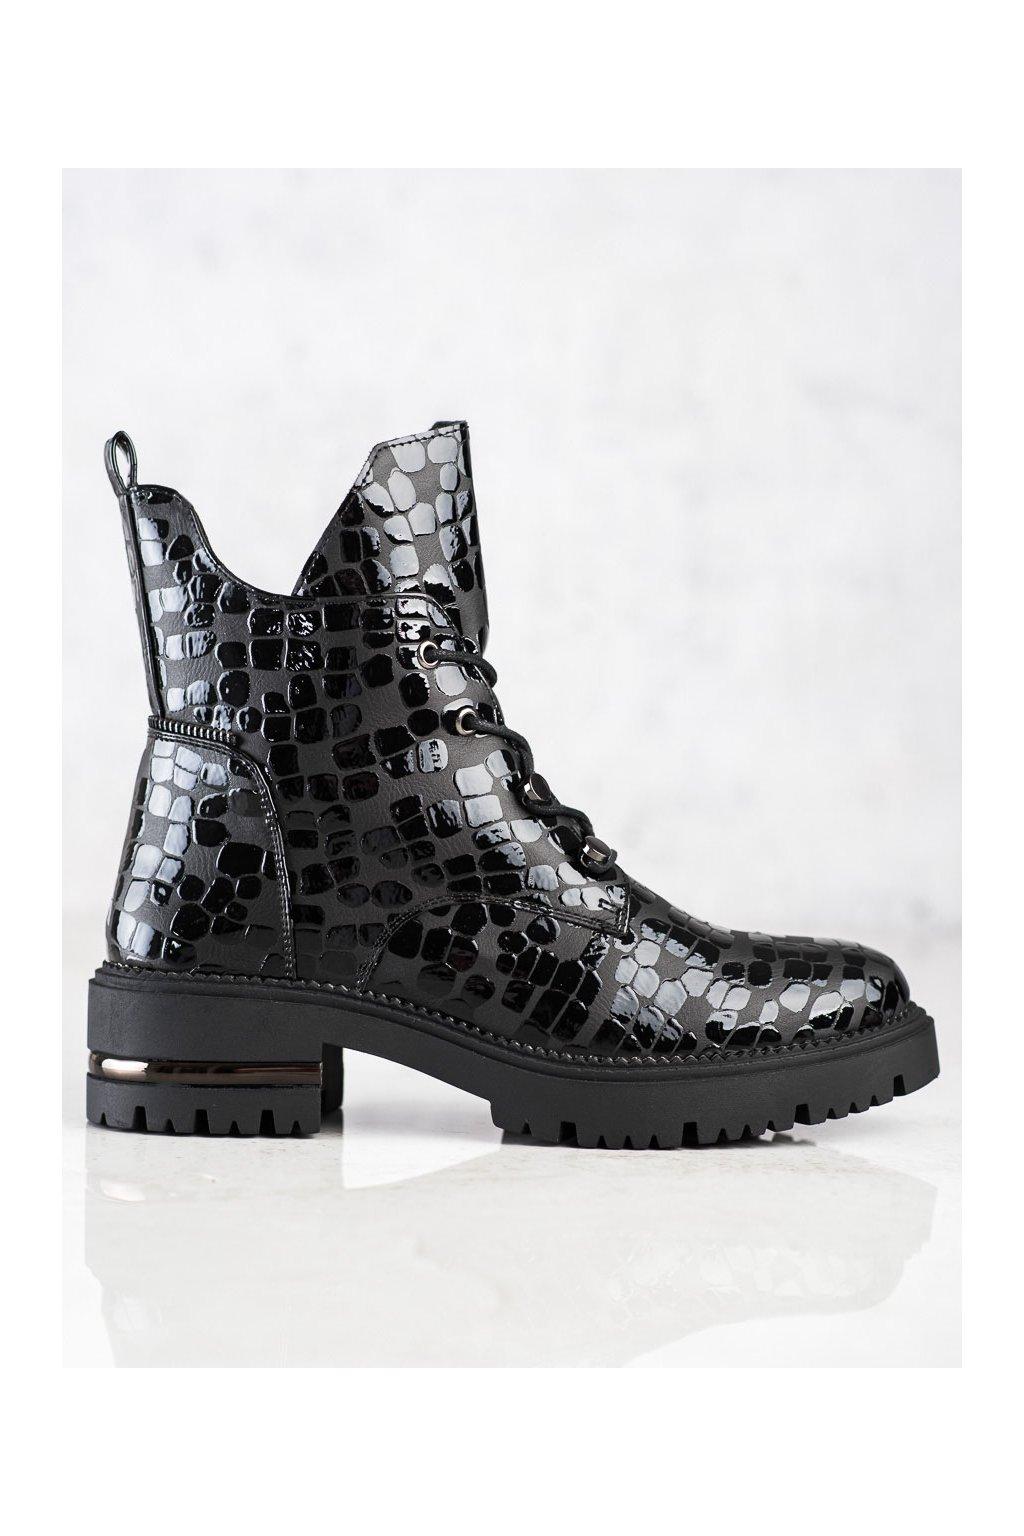 Čierne dámske topánky Sergio leone kod TR744B/B/B